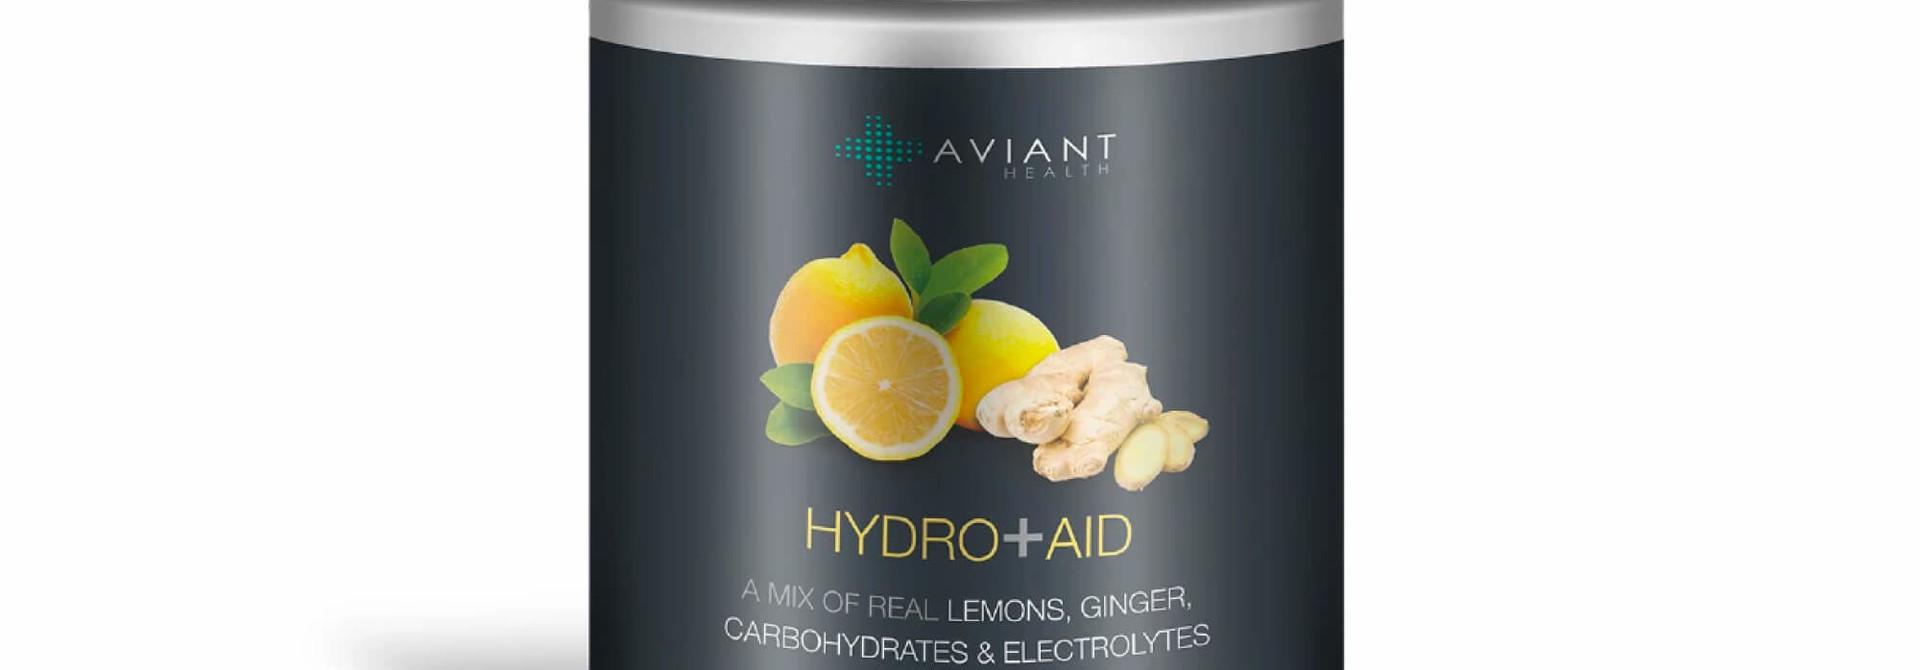 Aviant Hydro + Aid 300g Tub